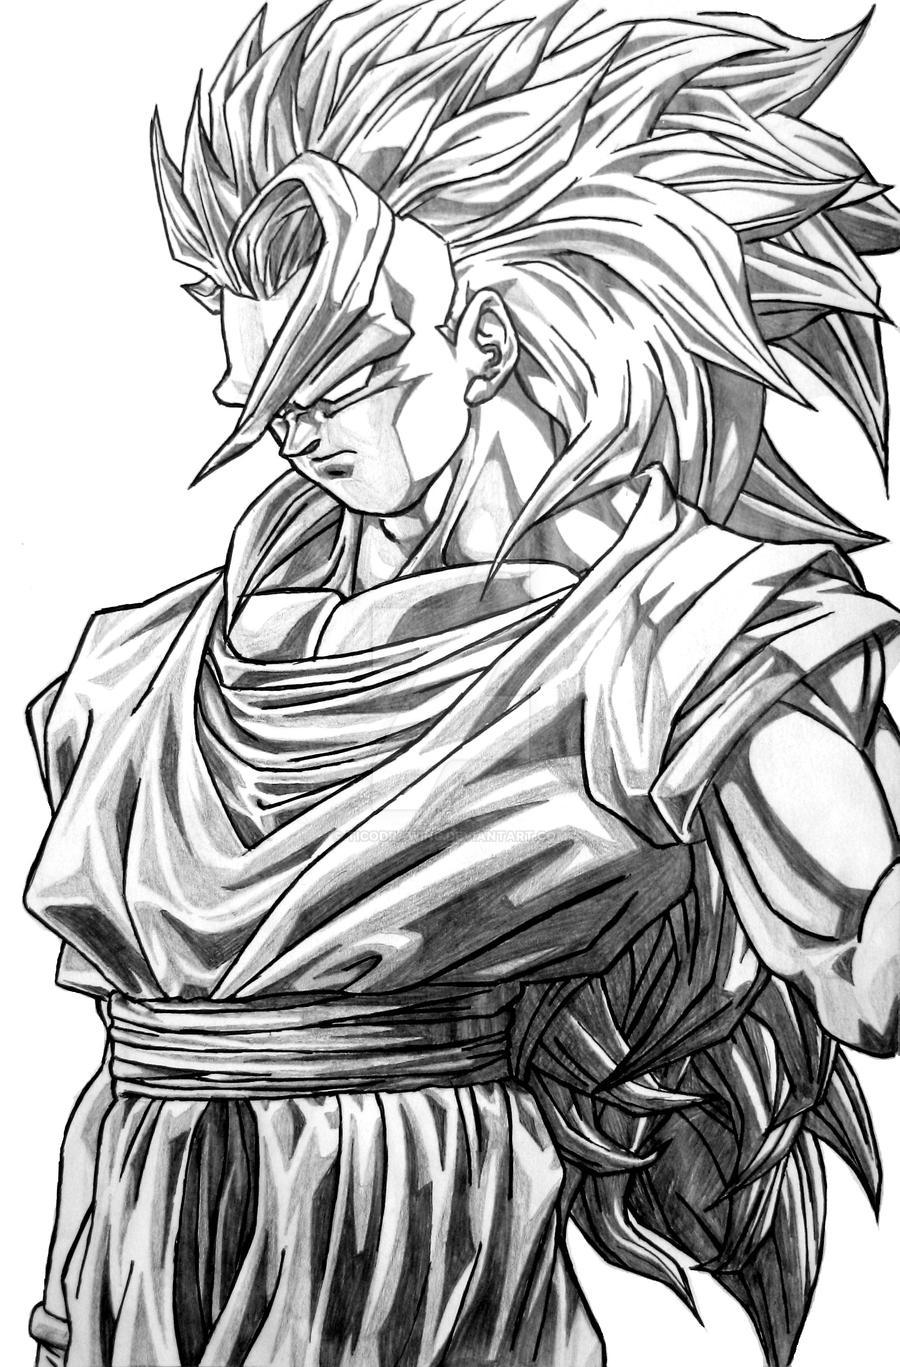 Goku Super Saiyan 3 By TicoDrawing On DeviantArt